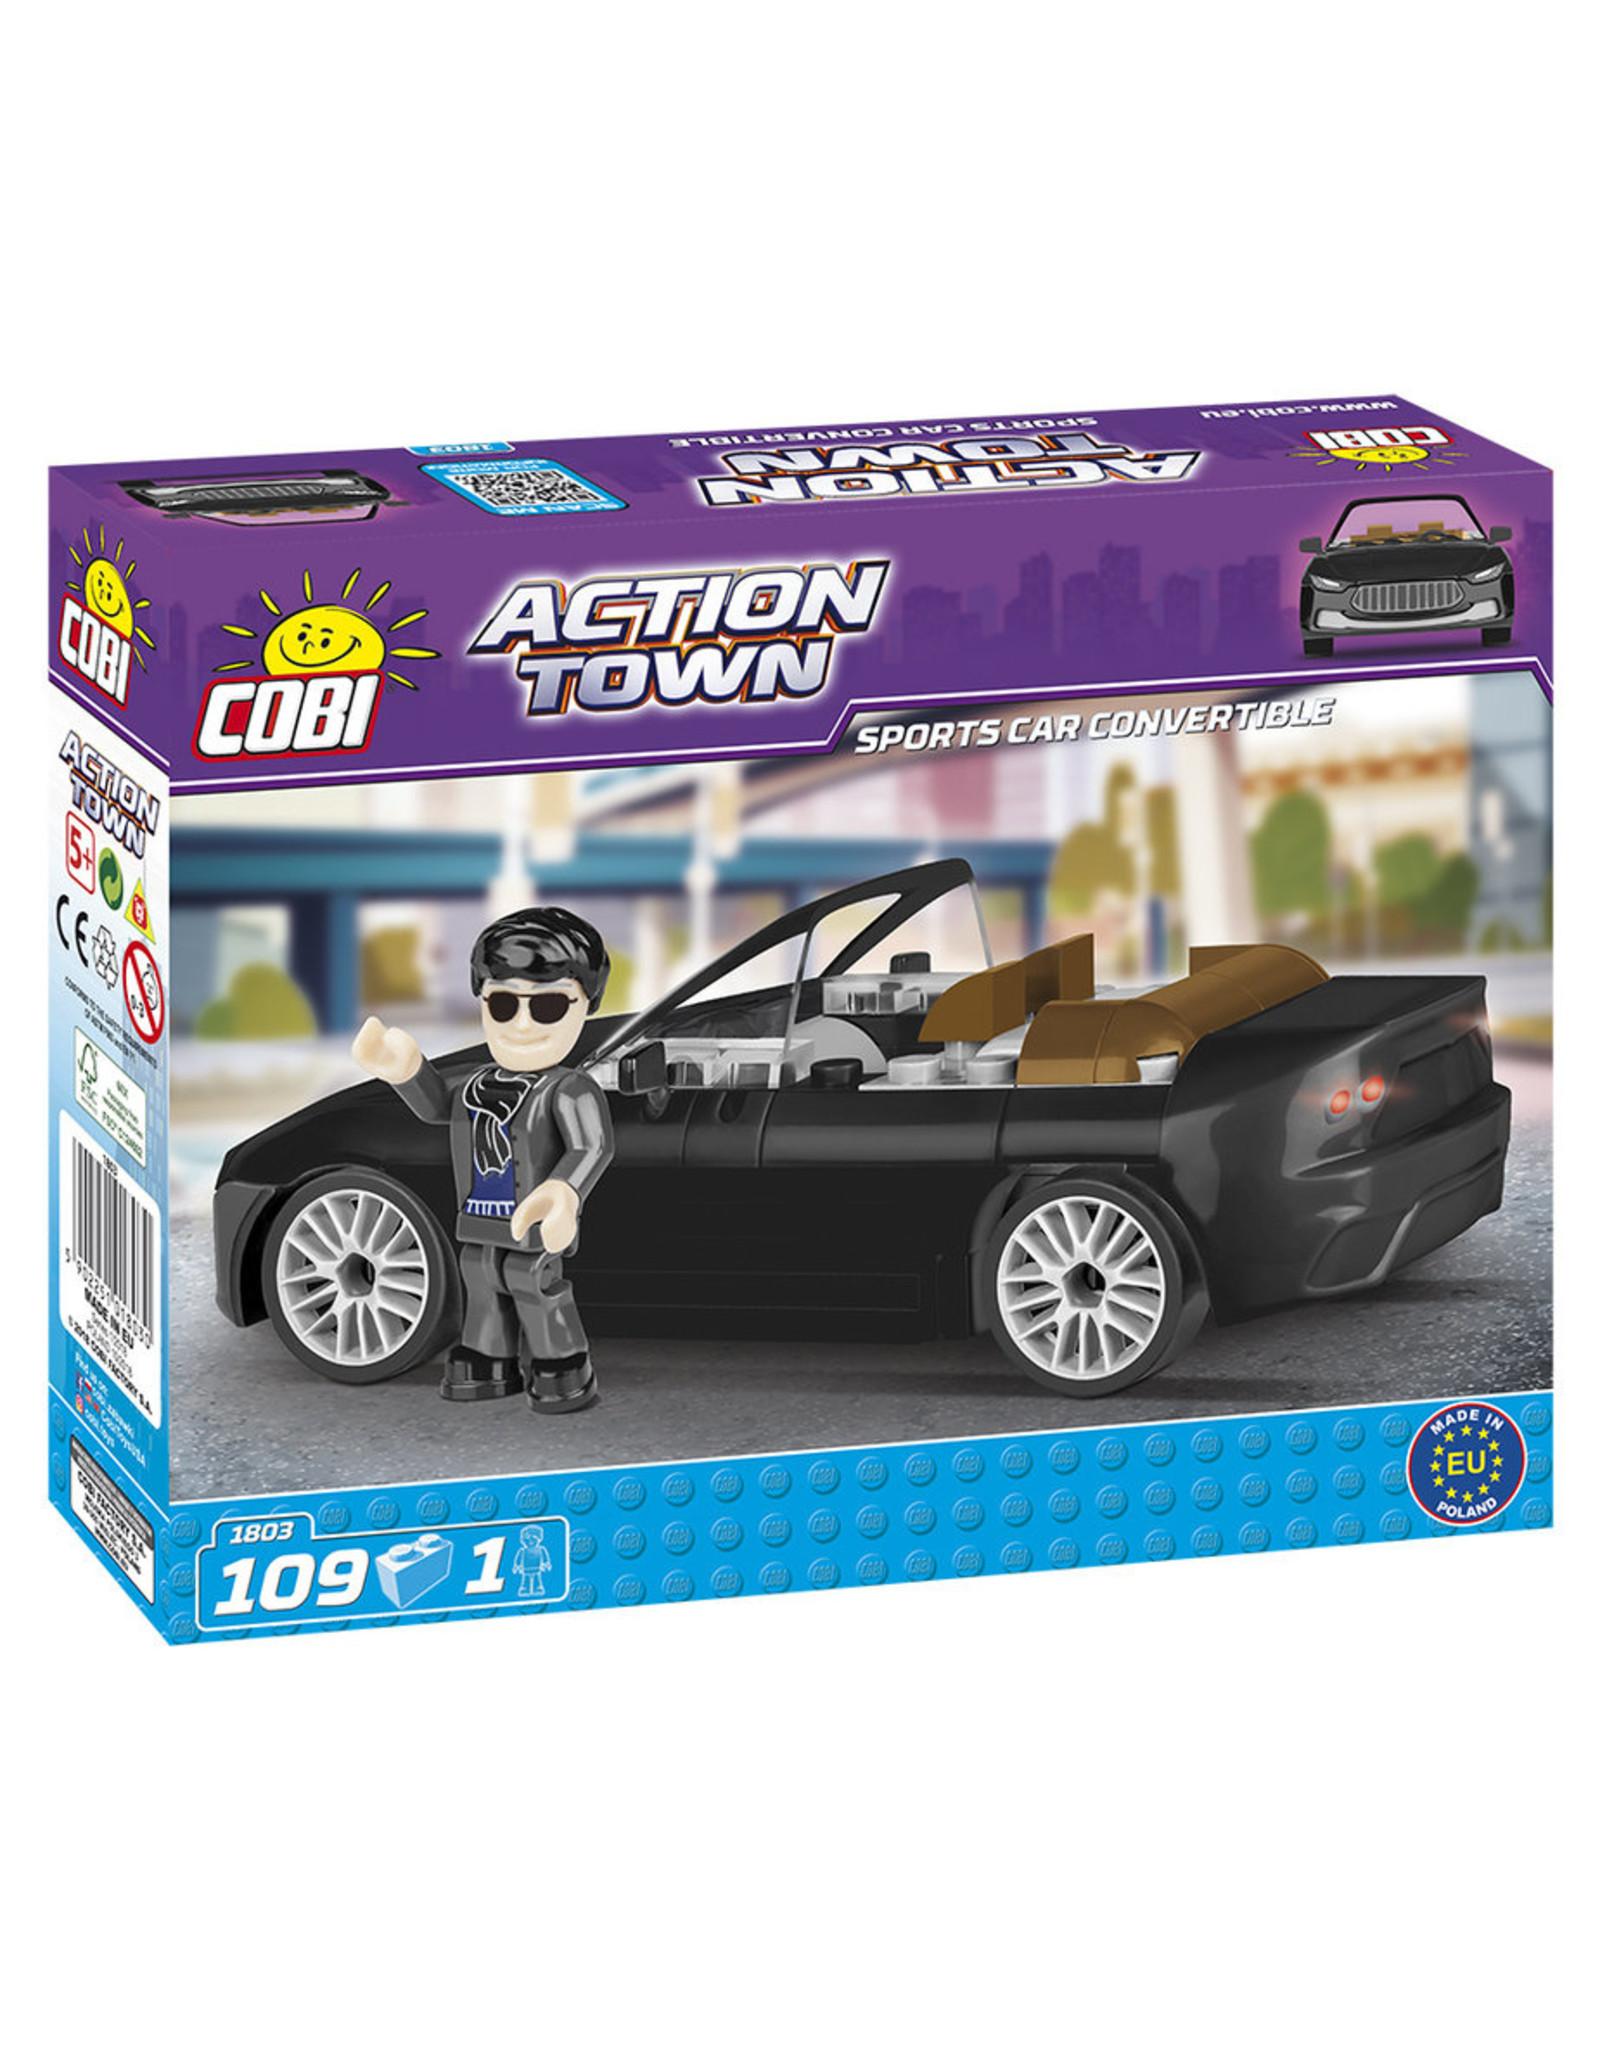 COBI COBI - Action Town 1803 - Sportscar Convertible Black